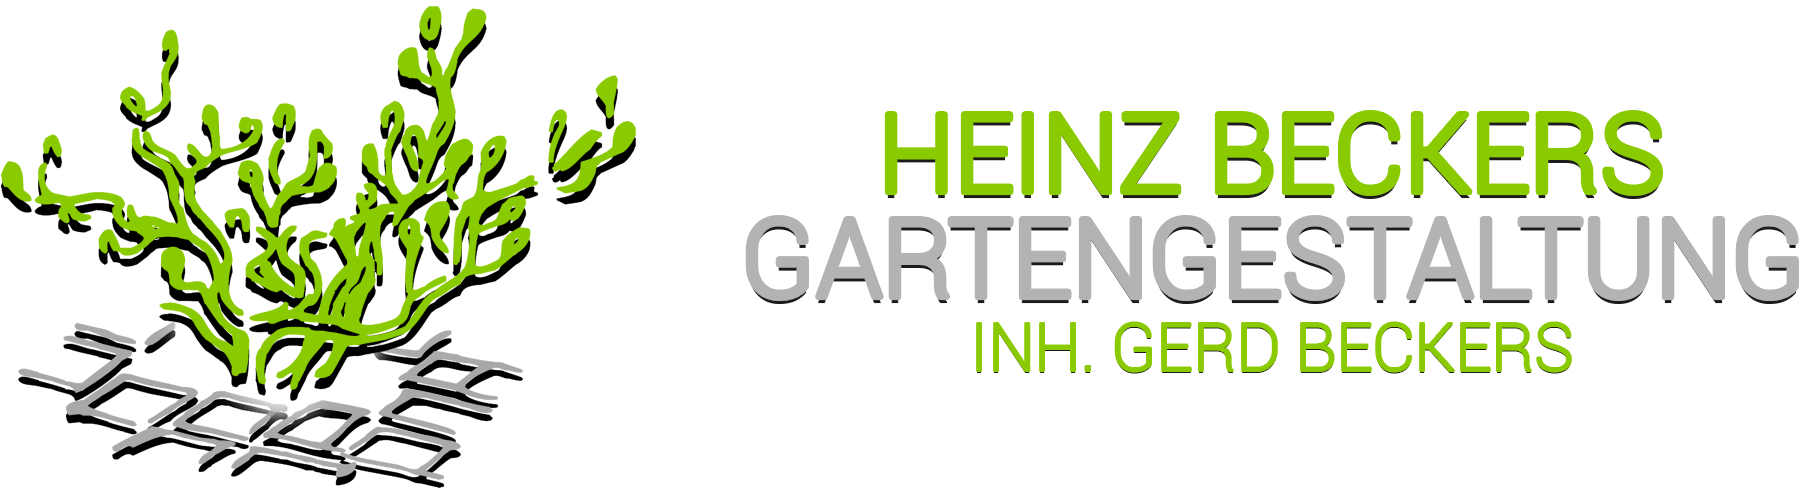 Heinz Beckers Gartengestaltung